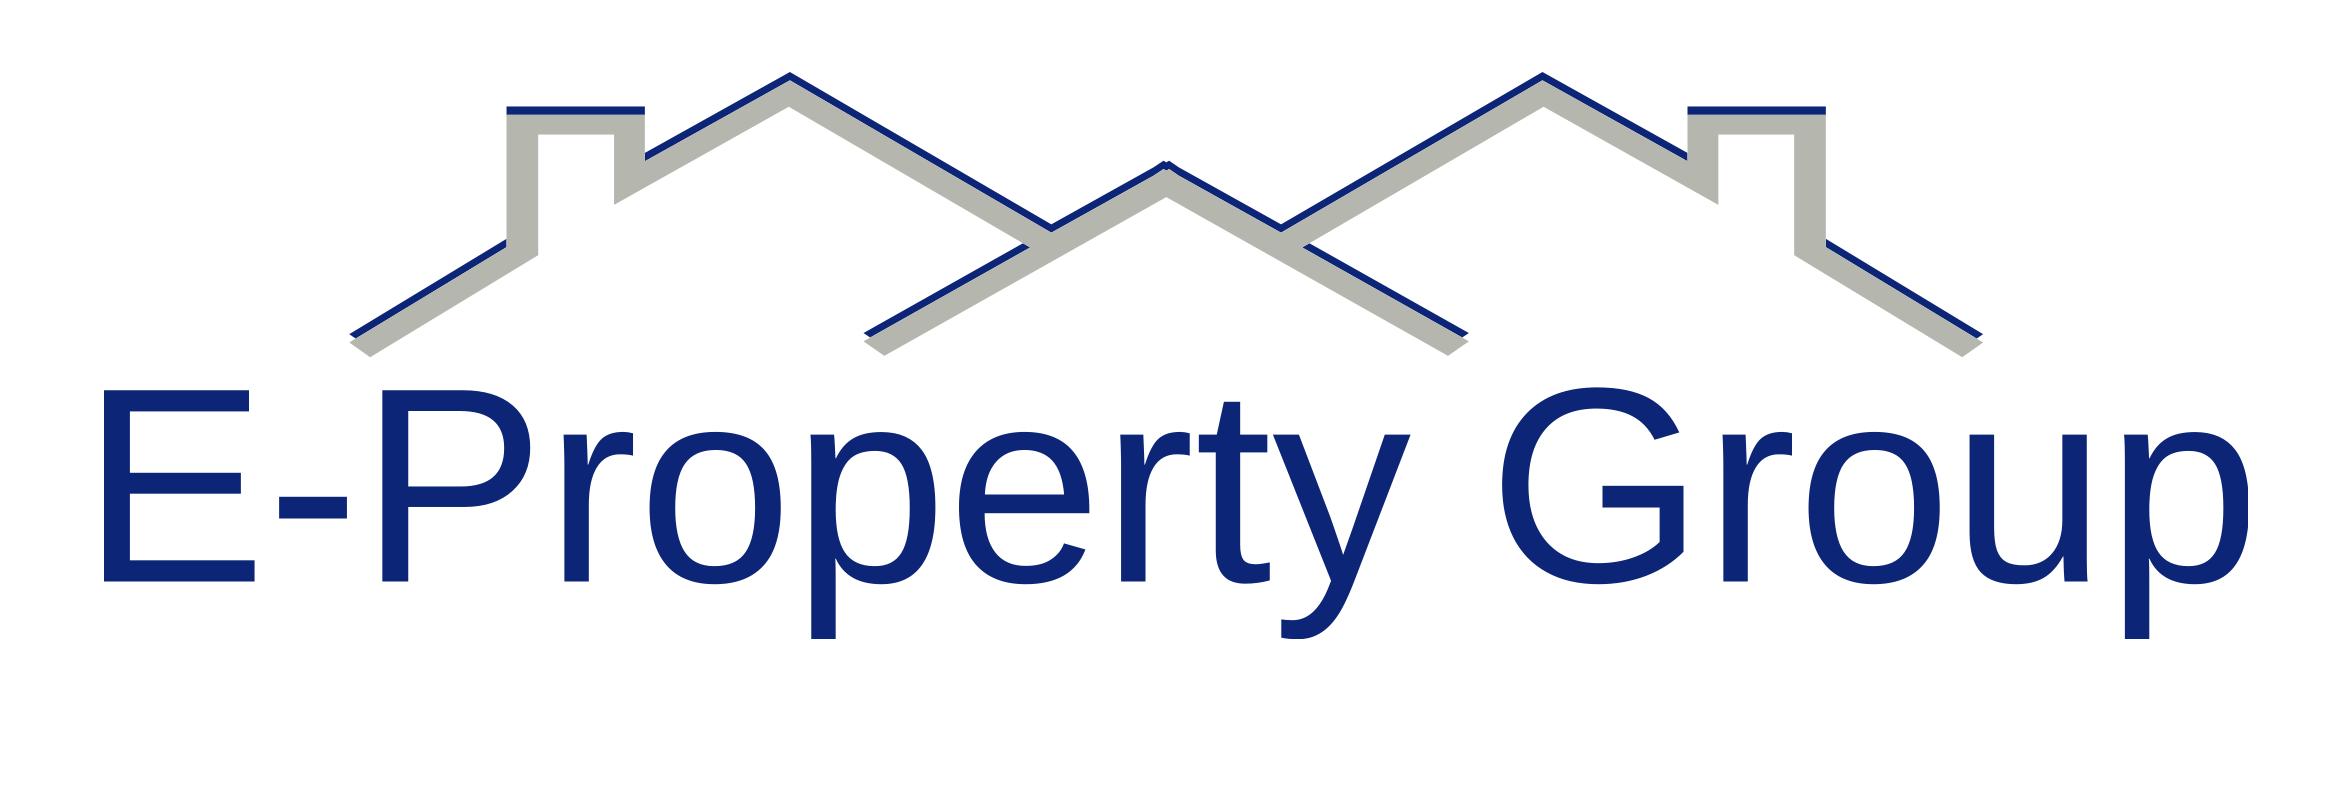 E-Property Group, LLC